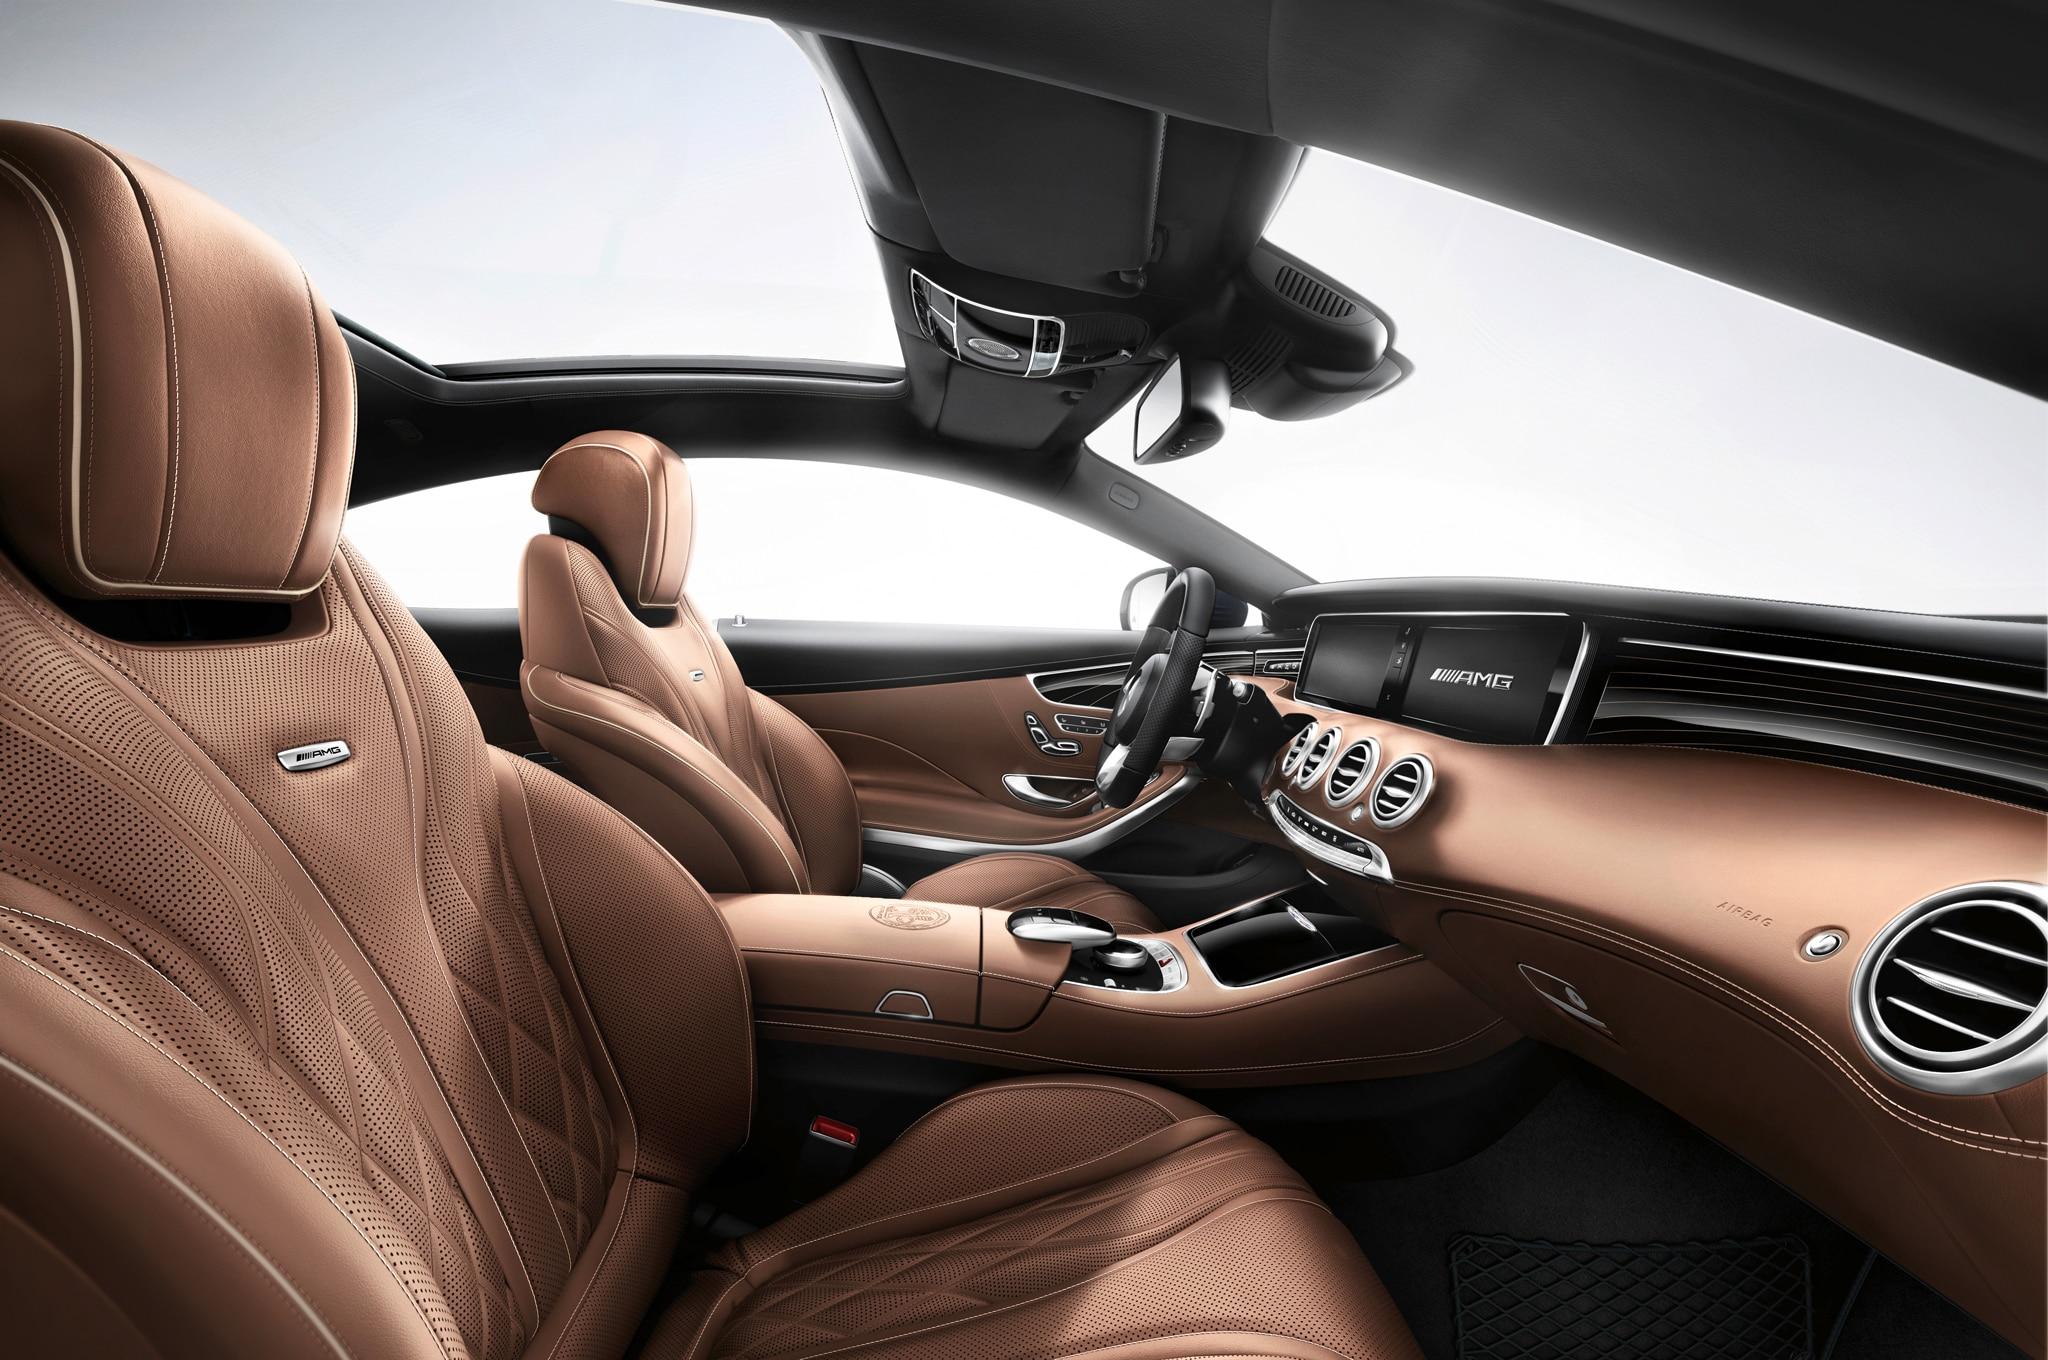 https://st.automobilemag.com/uploads/sites/11/2014/07/2015-Mercedes-Benz-S65-AMG-Coupe-interior-02.jpg